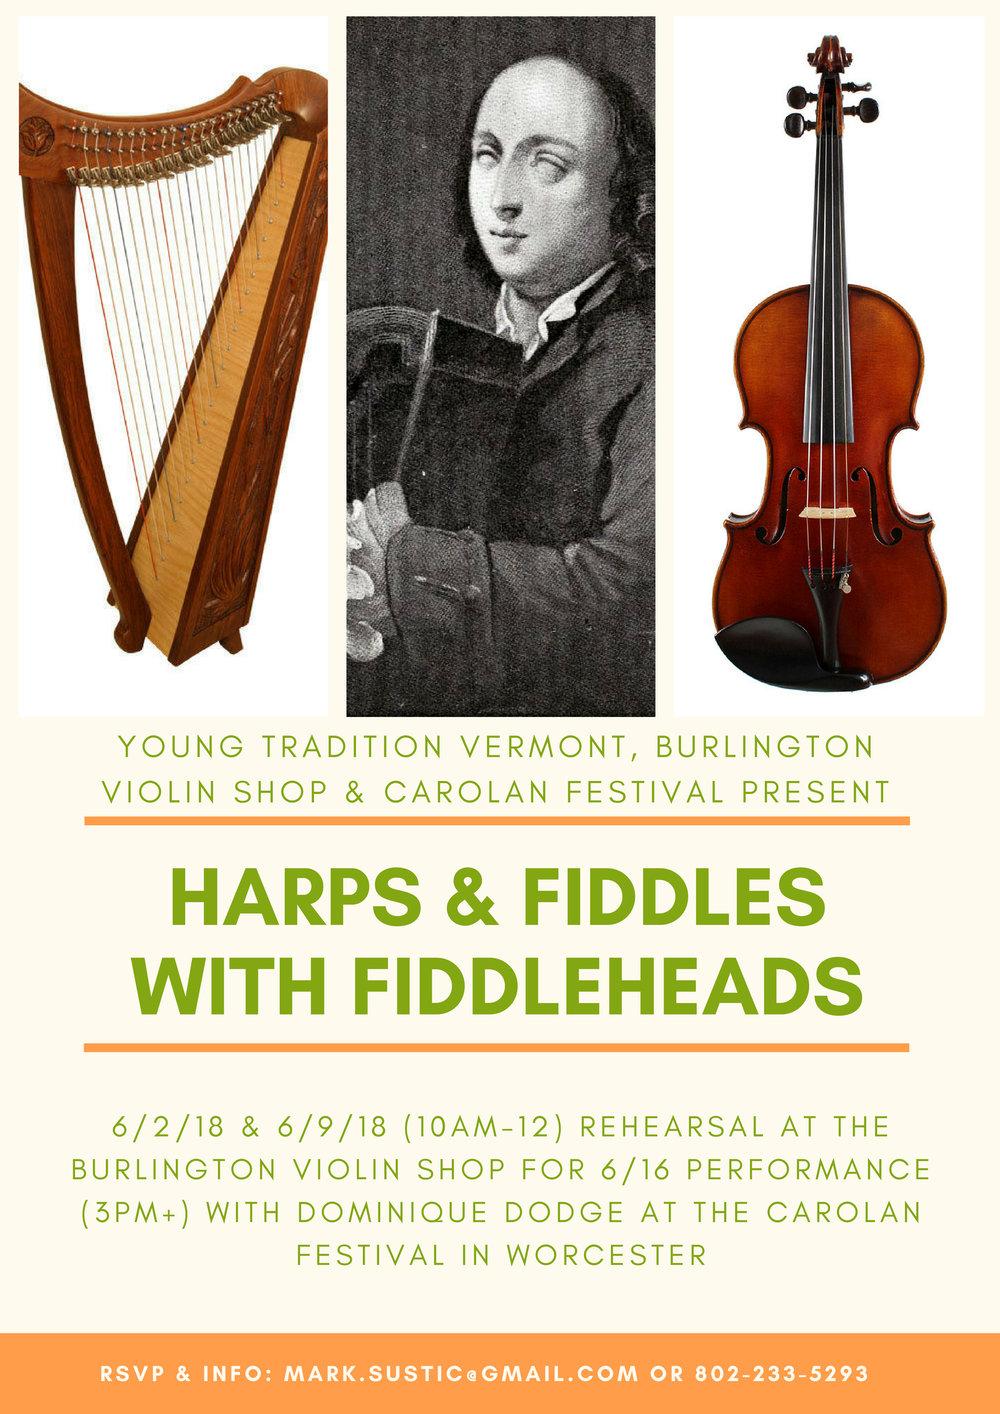 fiddleheads 6_2_18+.jpg